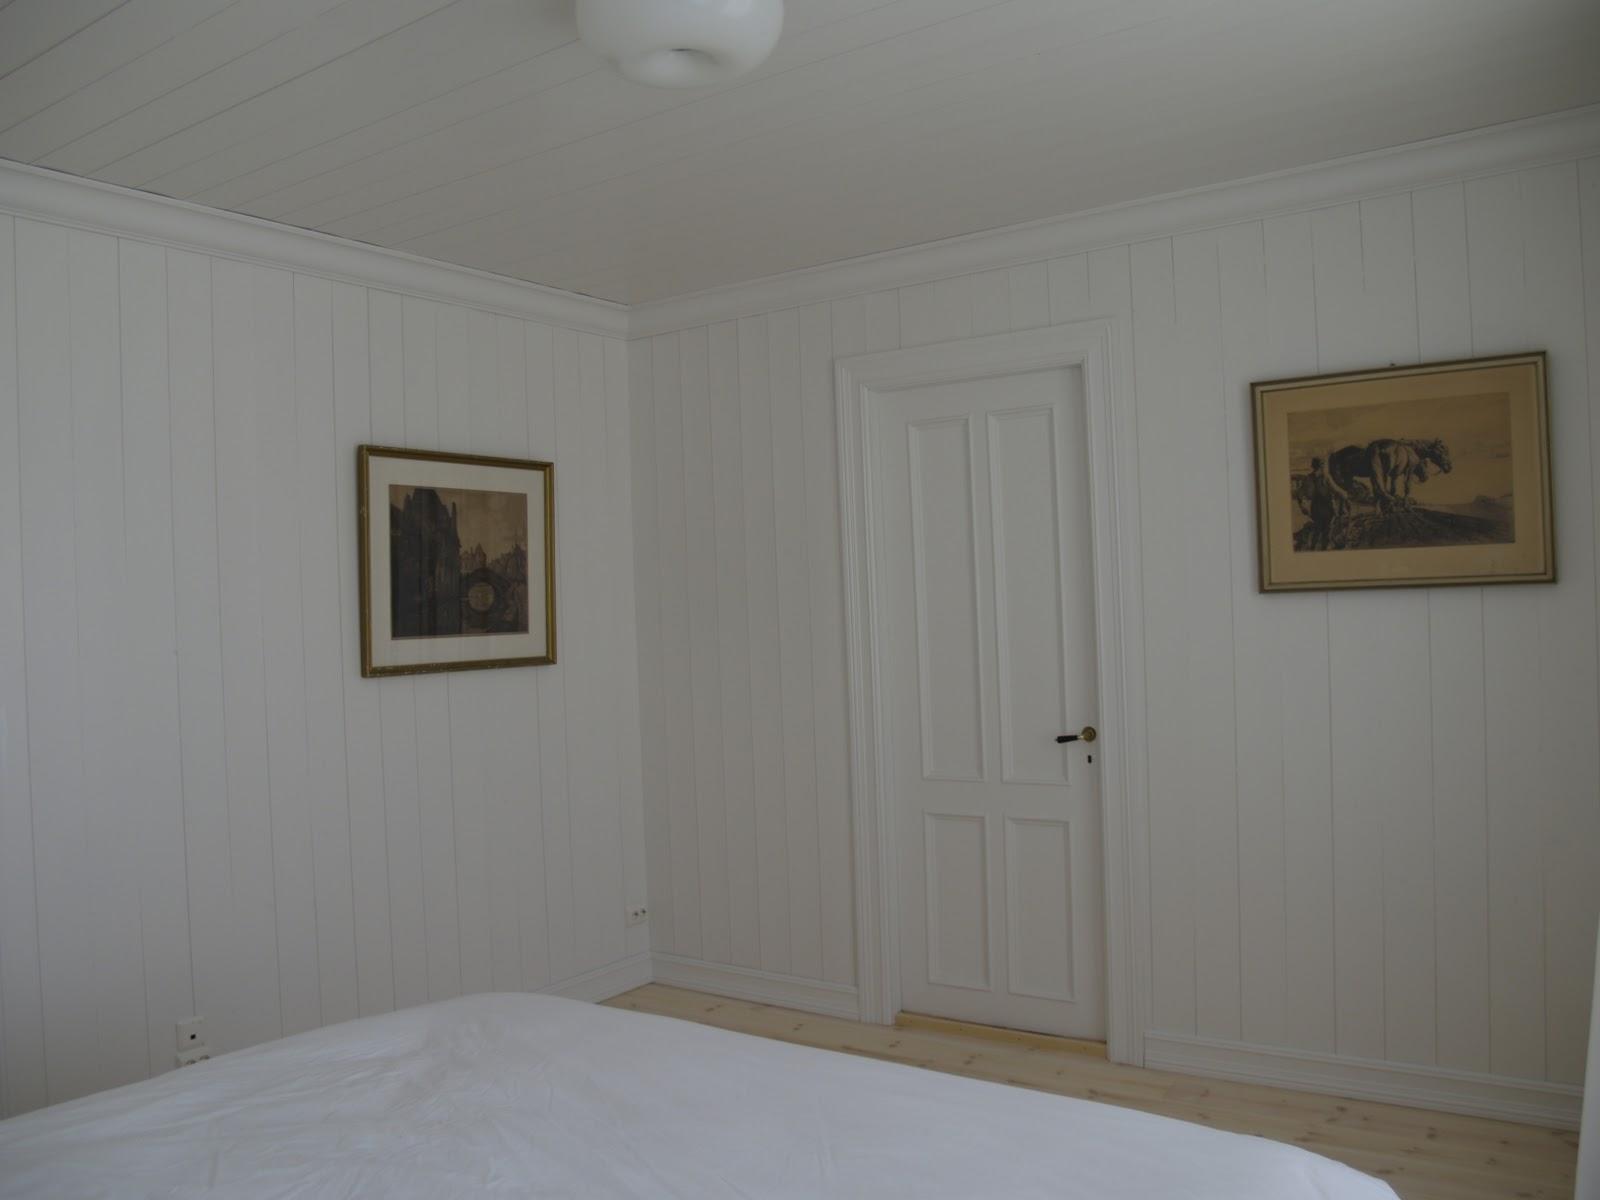 Storgata 16 - Kleedkamer badkamer ...